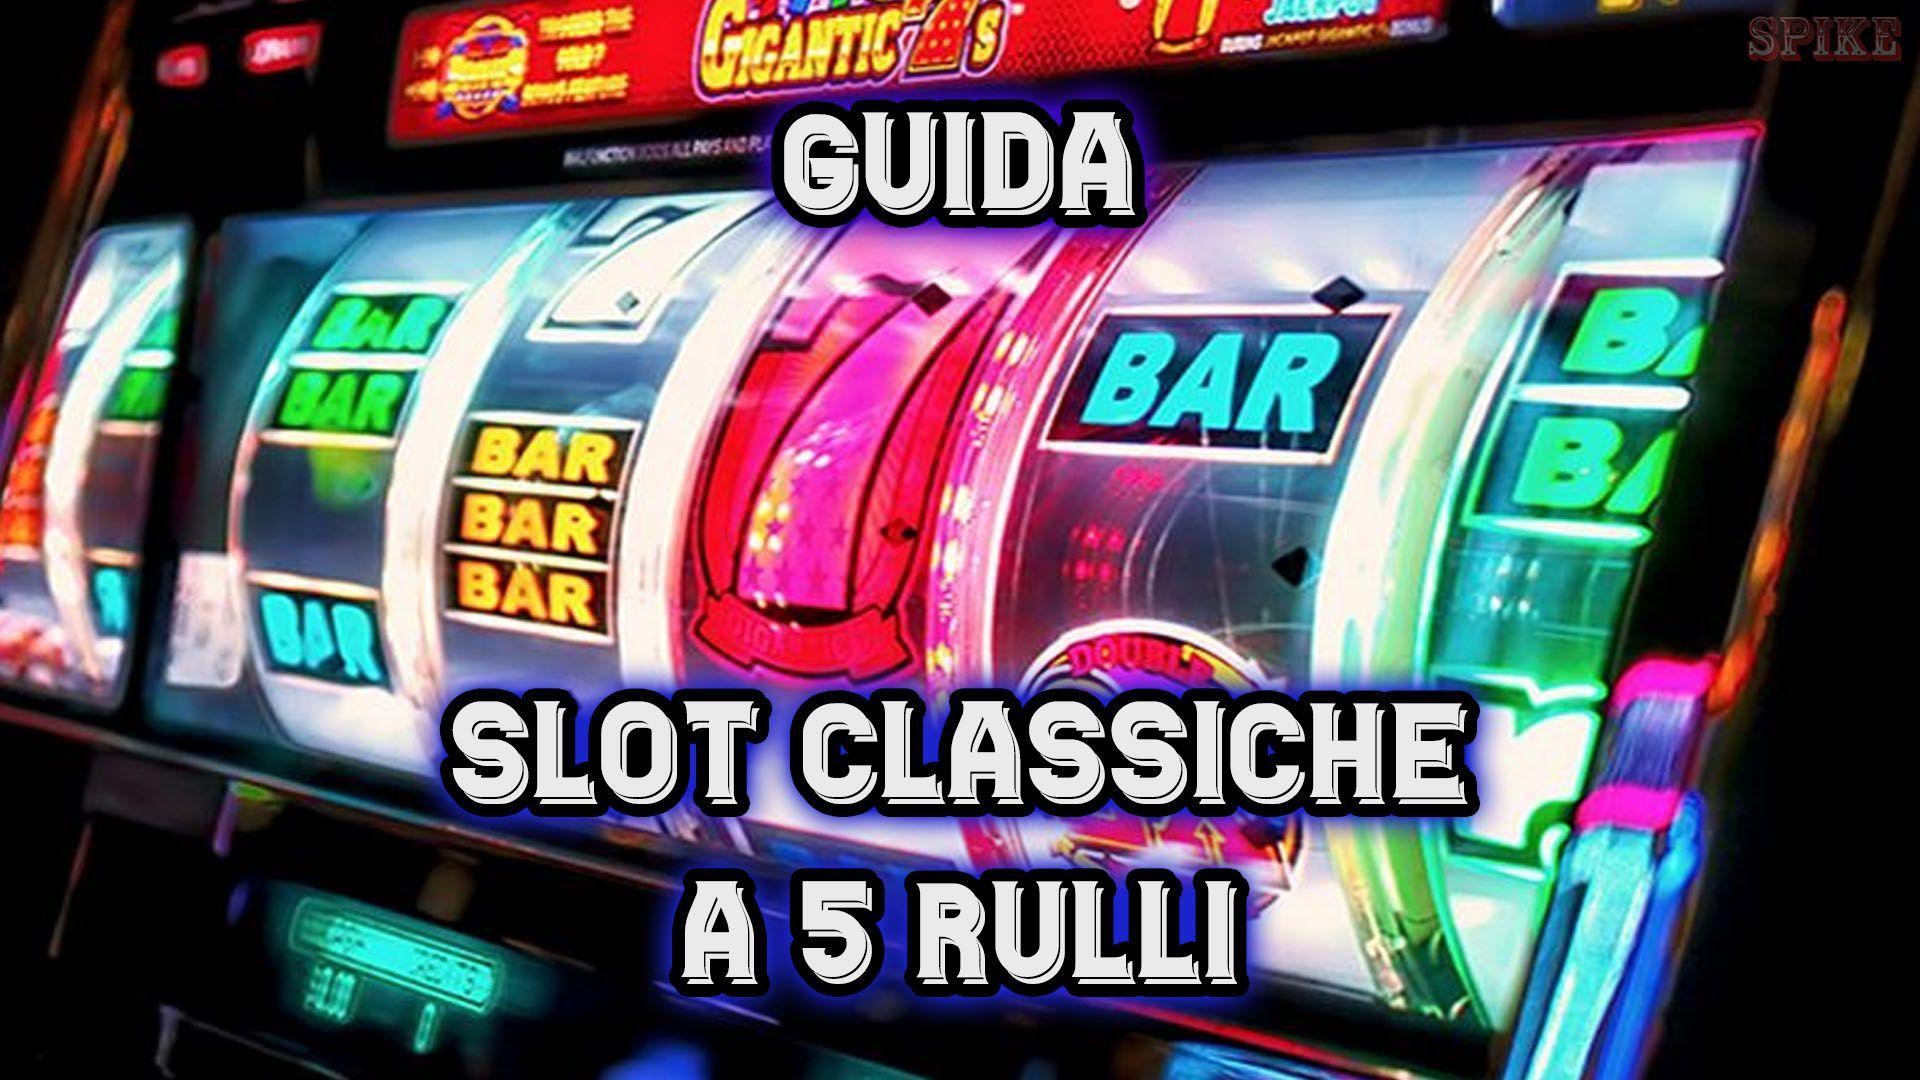 guida-funzionamento-slot-gratis-5-rulli2.jpg